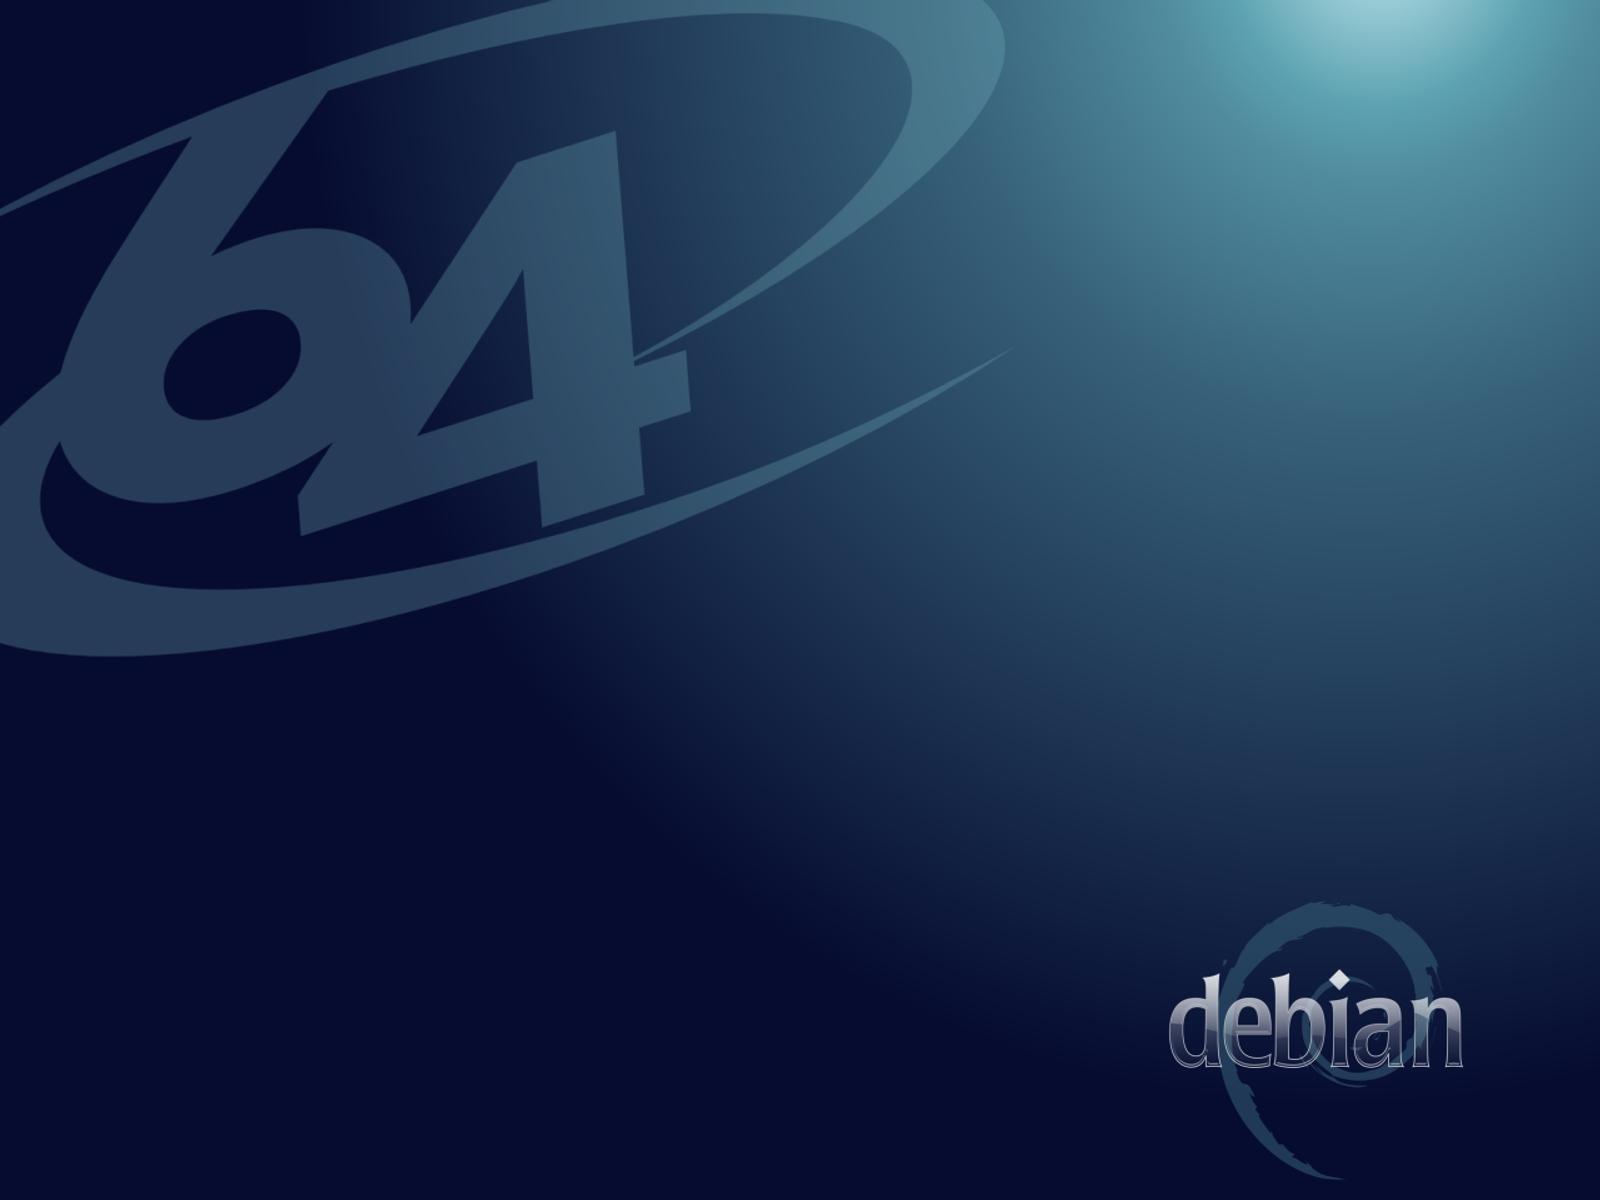 Debian Bits And Snips: Debian 64 Bit Wallpaper